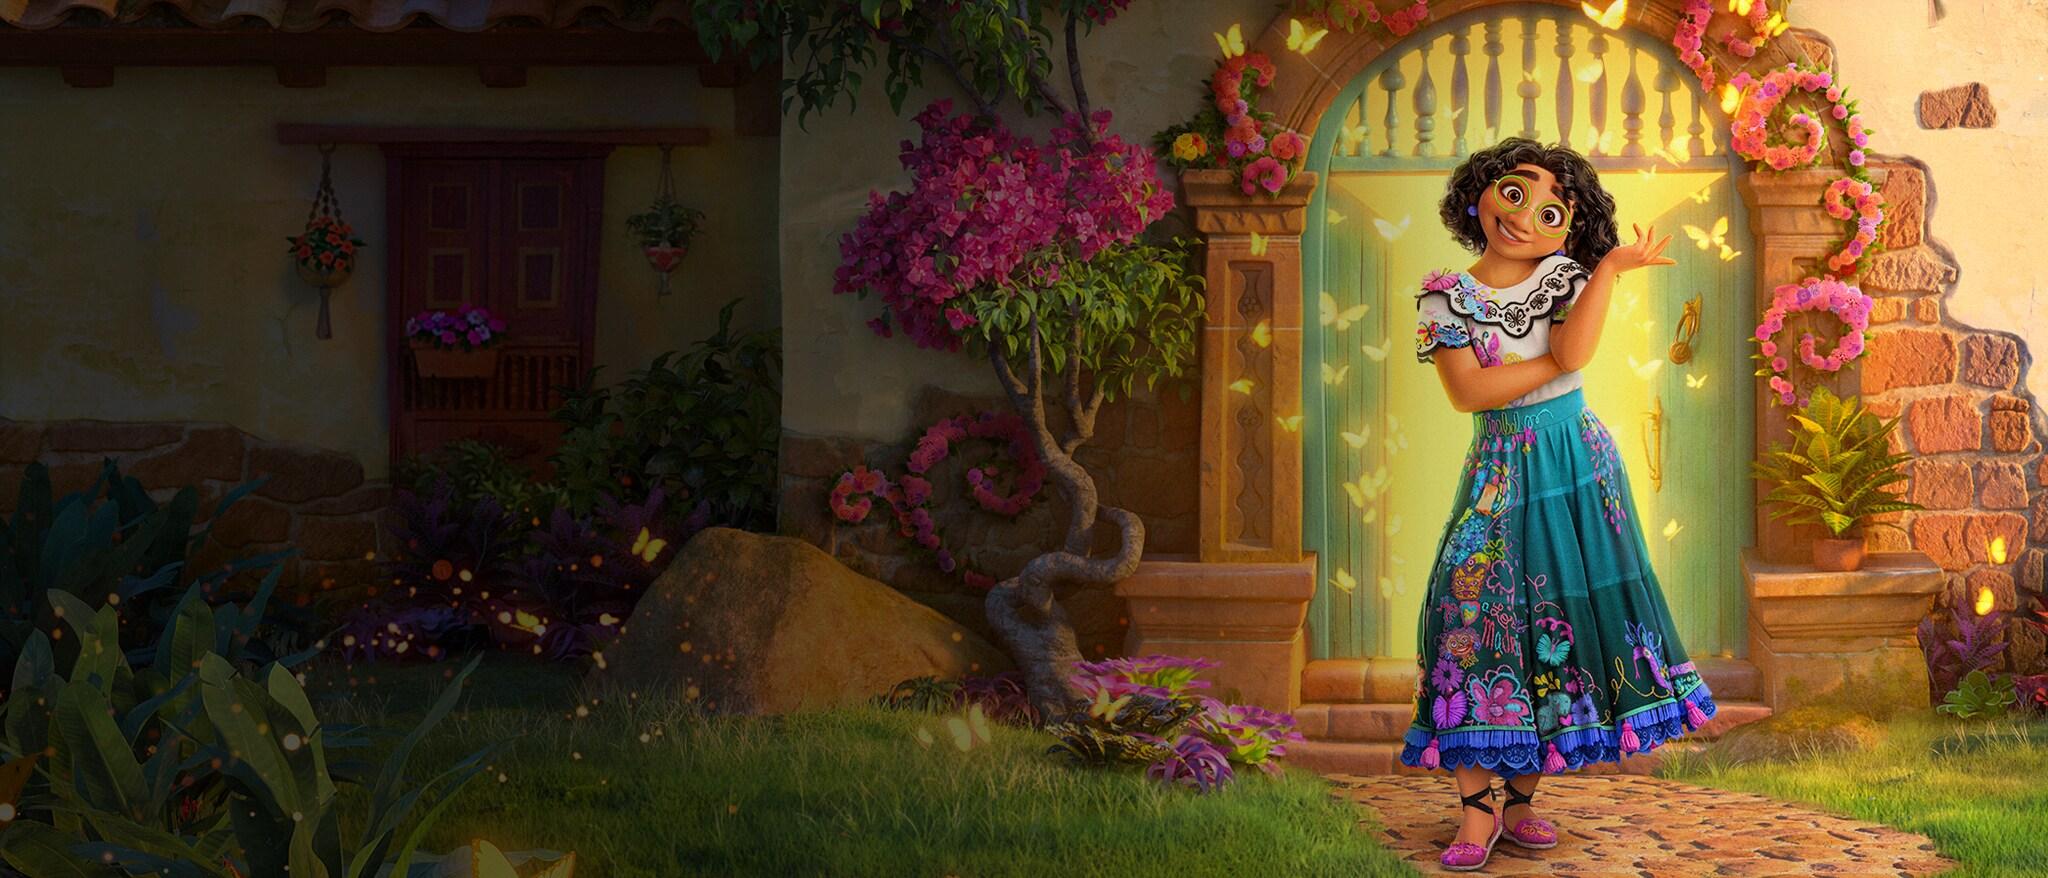 Hero - Disney - Encanto Trailer - Movie Showcase Page